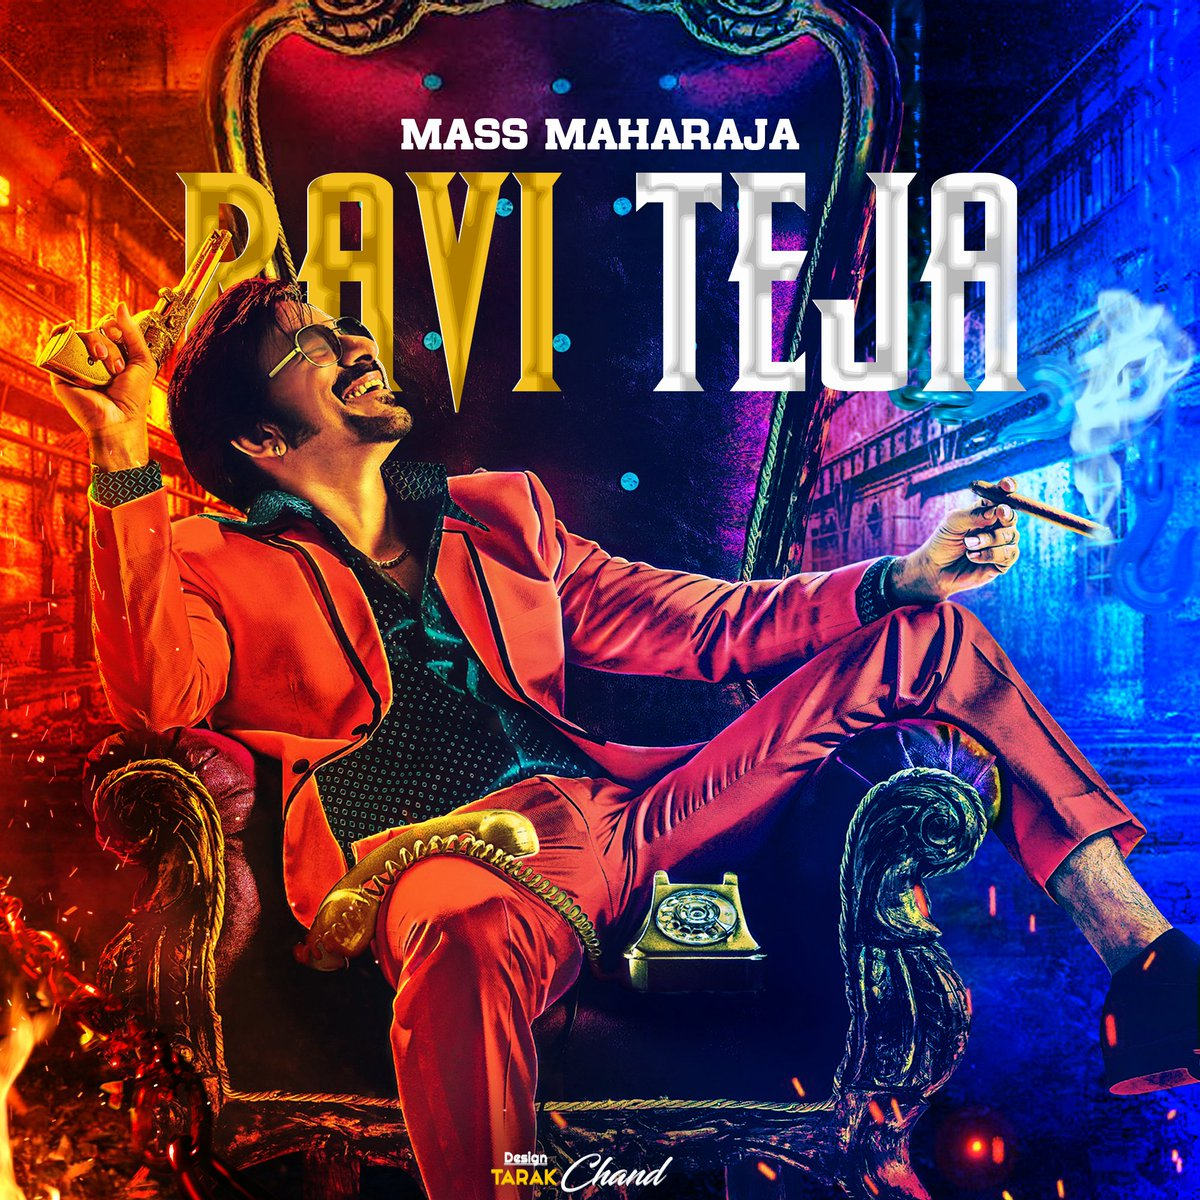 Disco Raja (2020) Telugu Movie 480p PreDVDRip x264 400MB